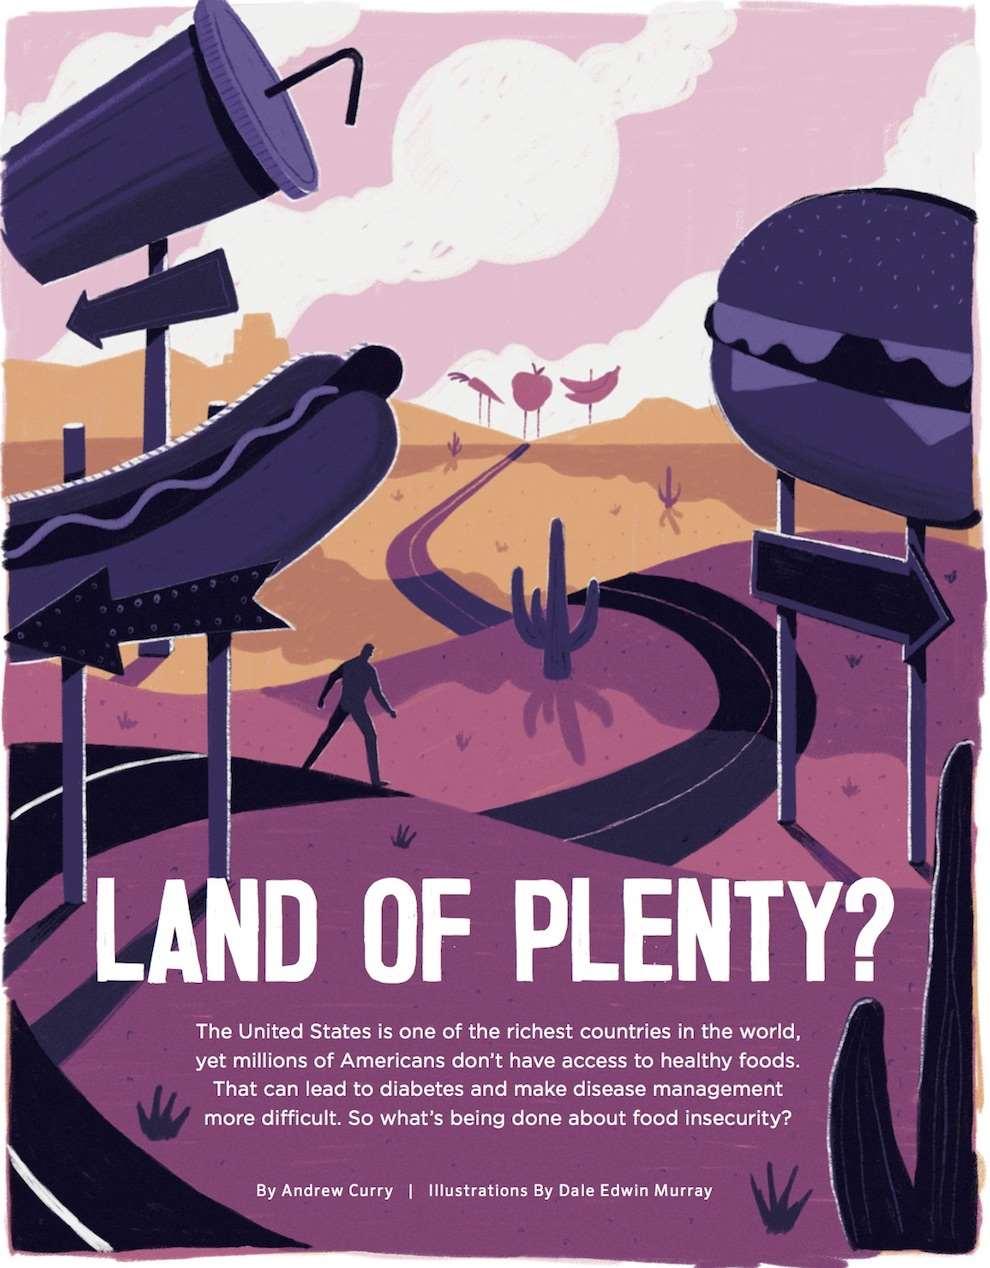 Dale Edwin Murray, Magazine cover illustration